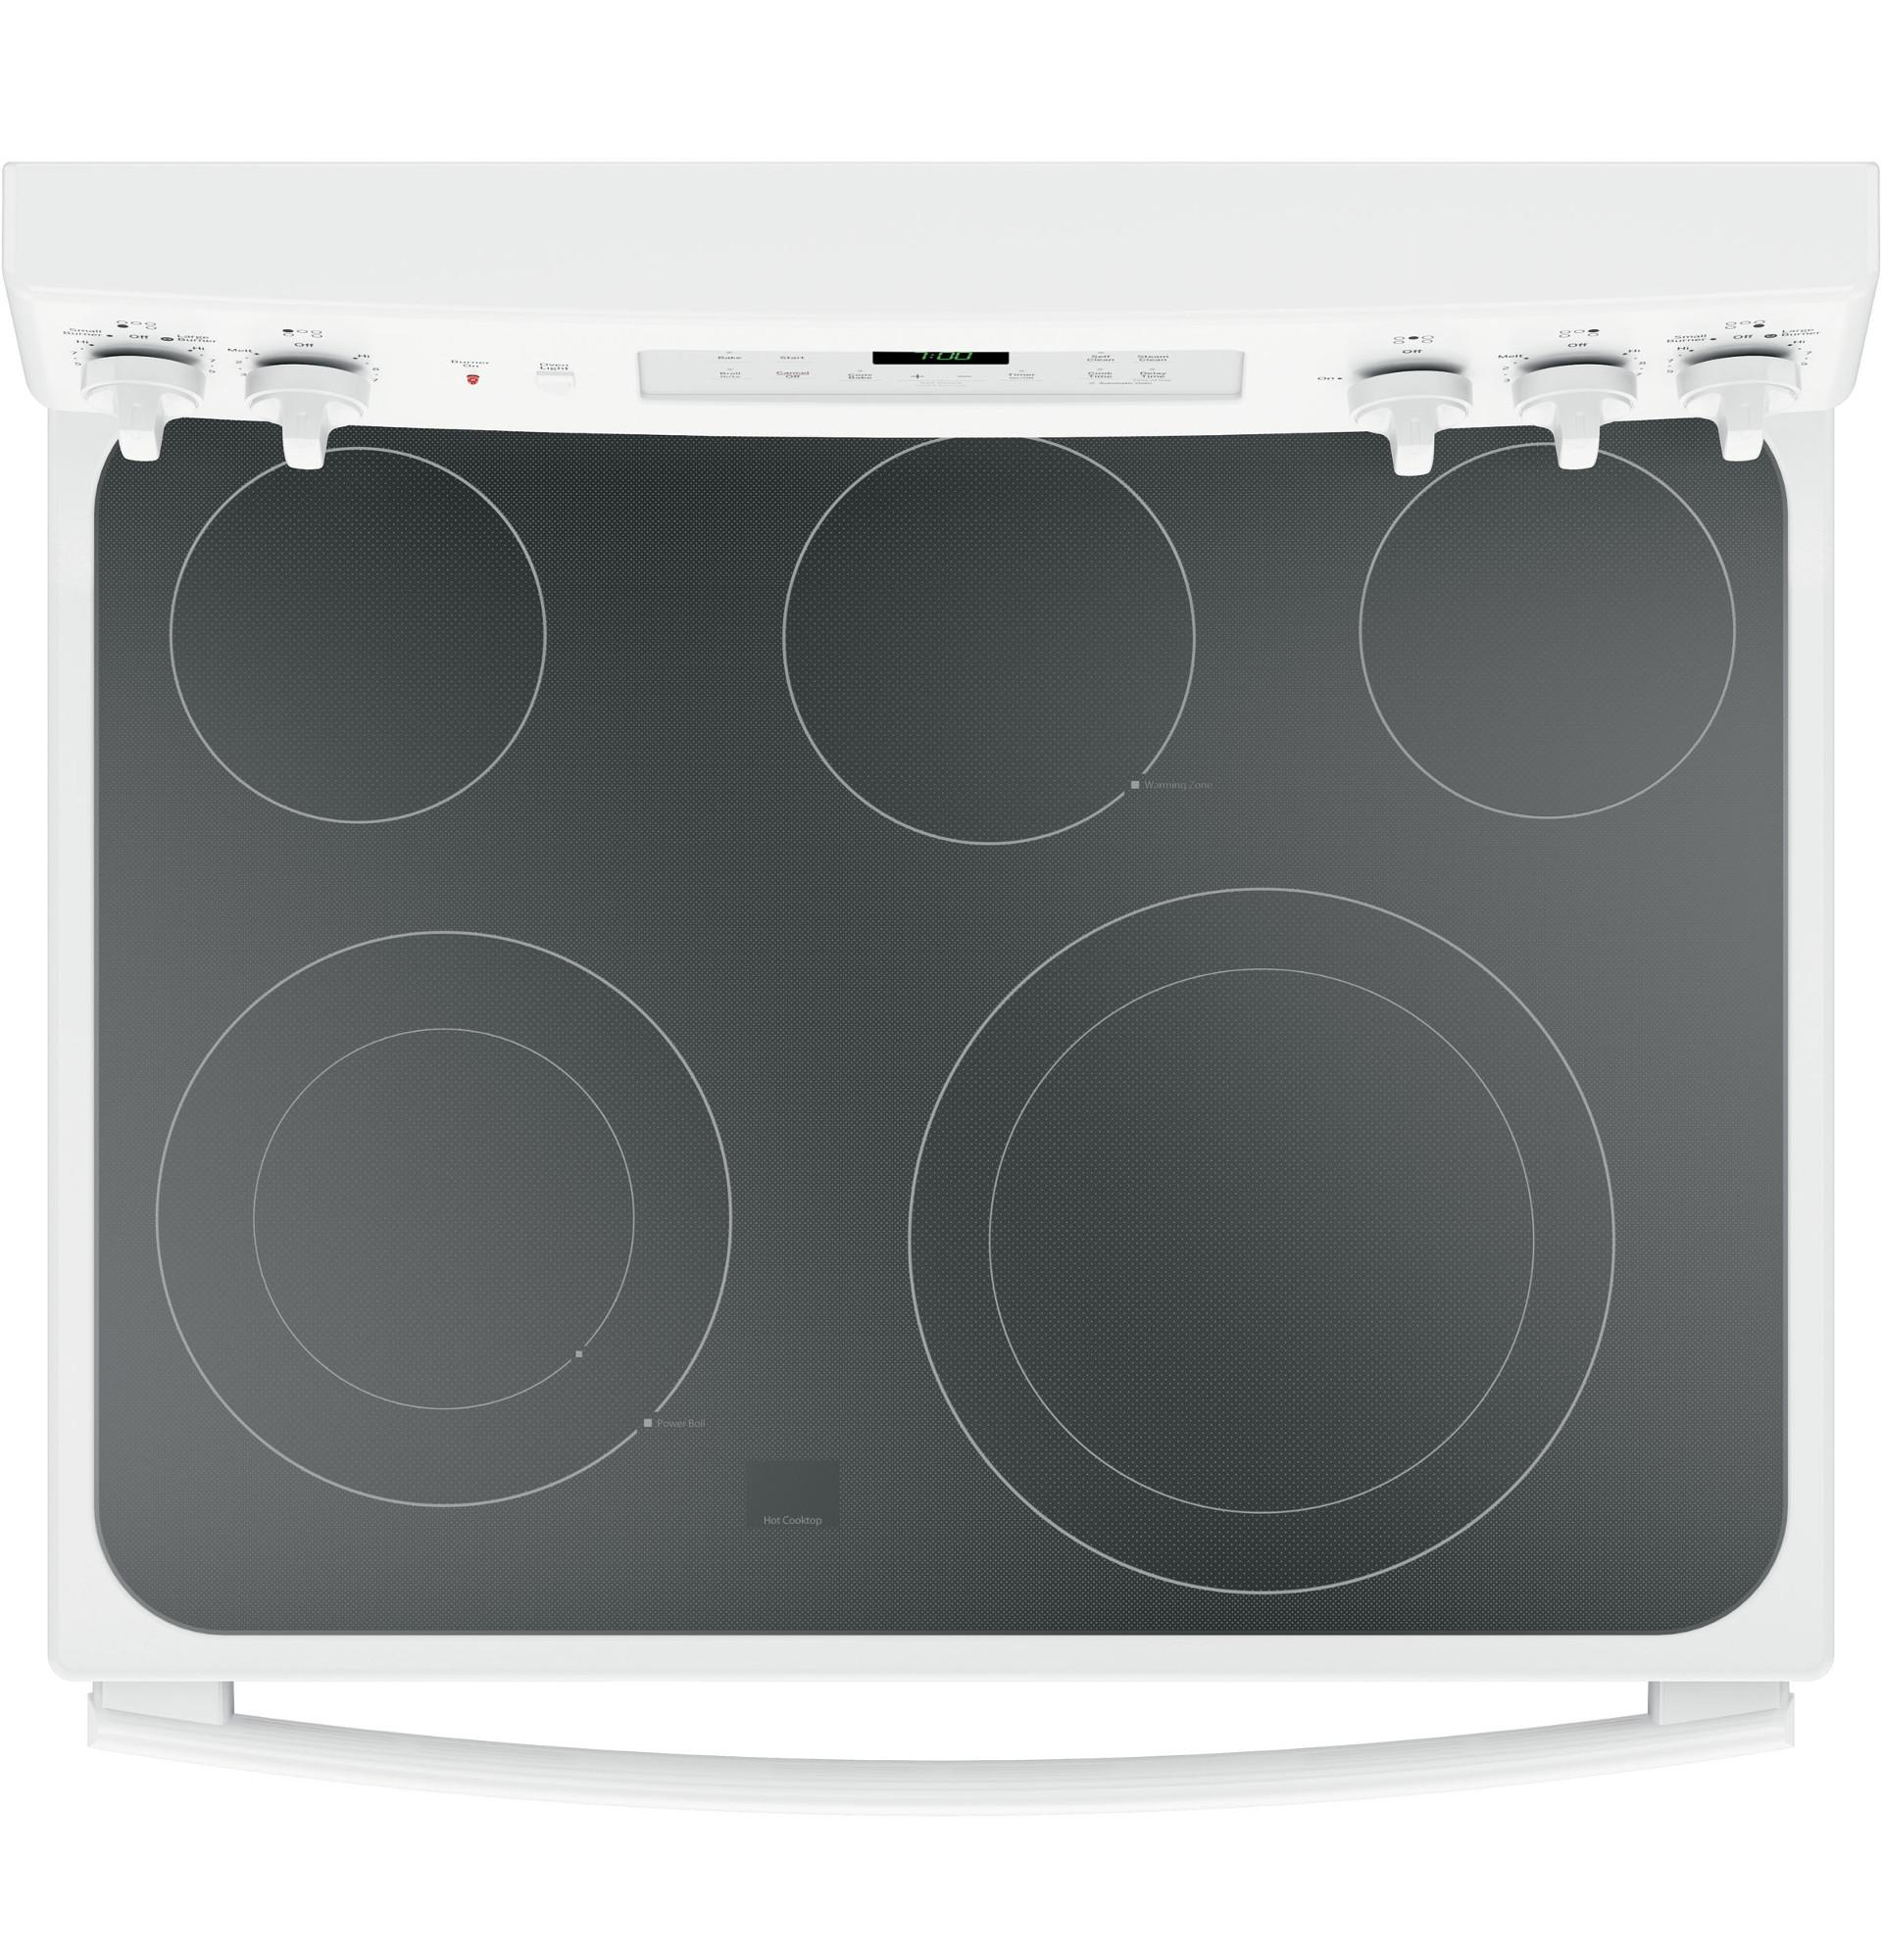 GE Appliances JB700DJWW 5.3 cu. ft. Freestanding Electric Convection Range - White